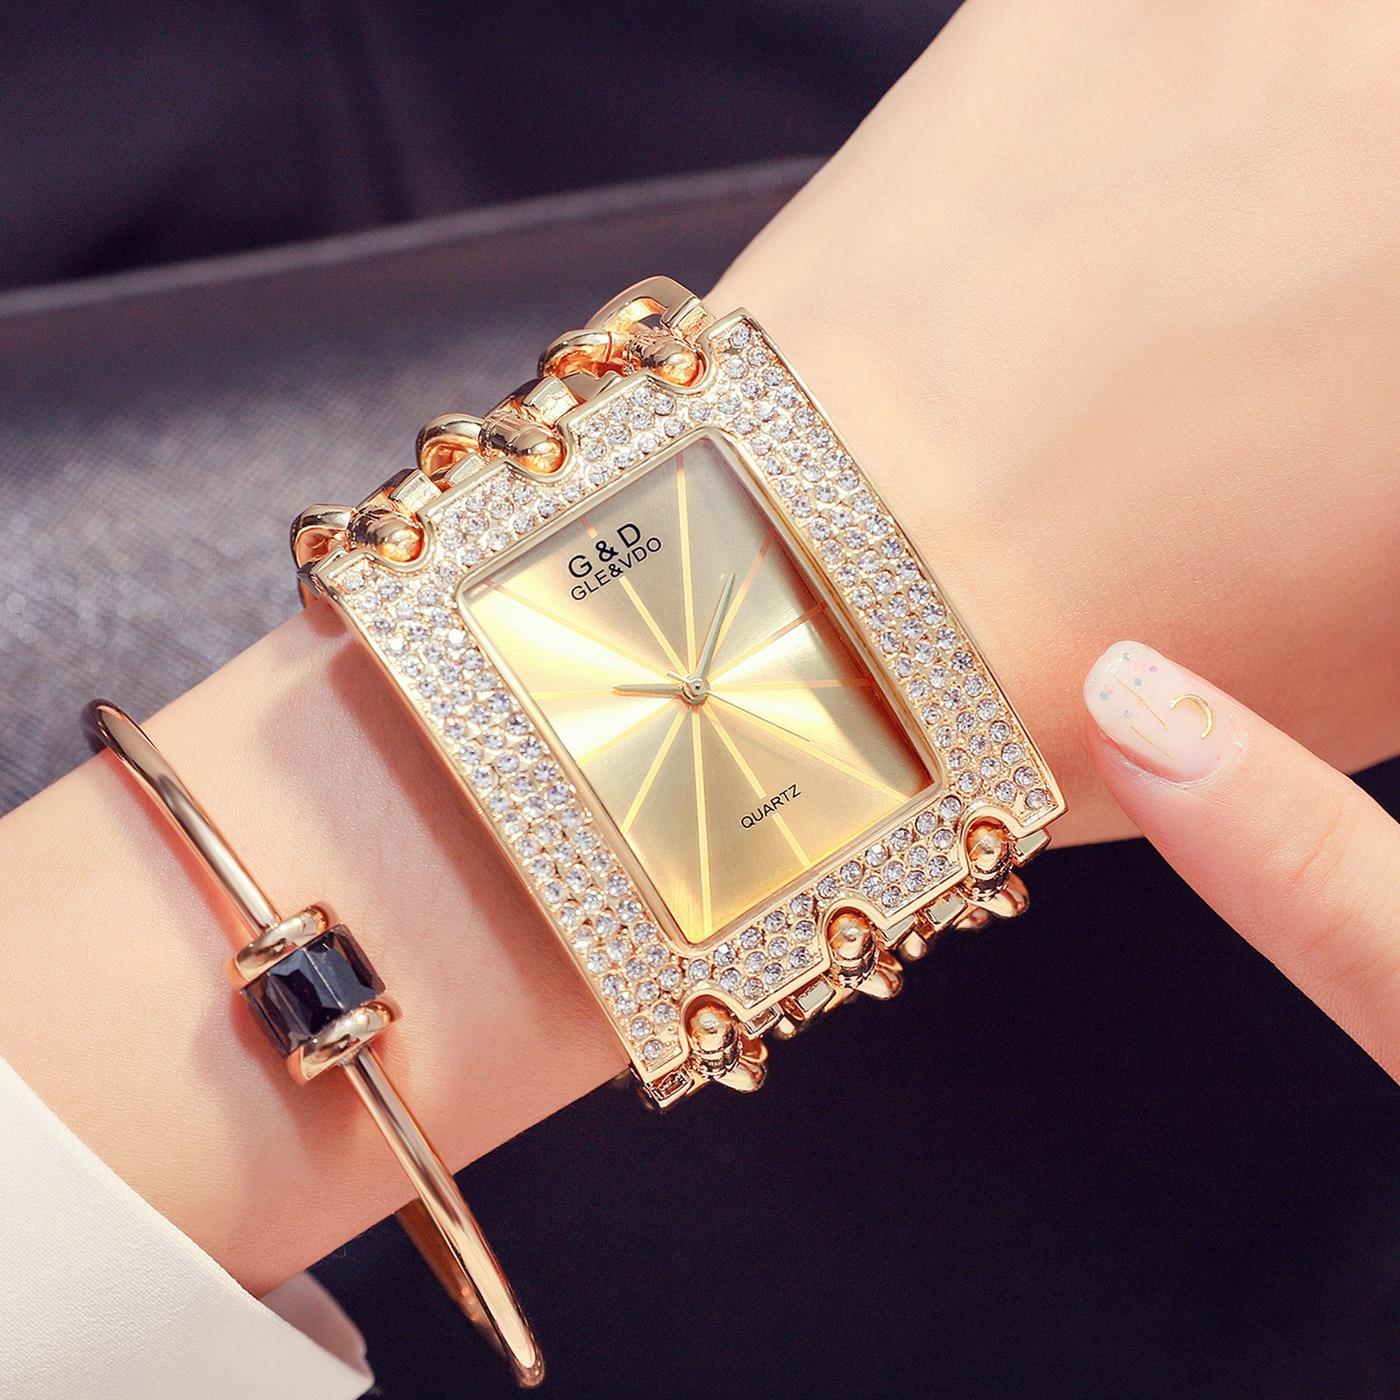 G&D 2021 New Casual Fashion Women's Bracelet Watch Three Chain Diamond Quartz Watch Free Shipping enlarge